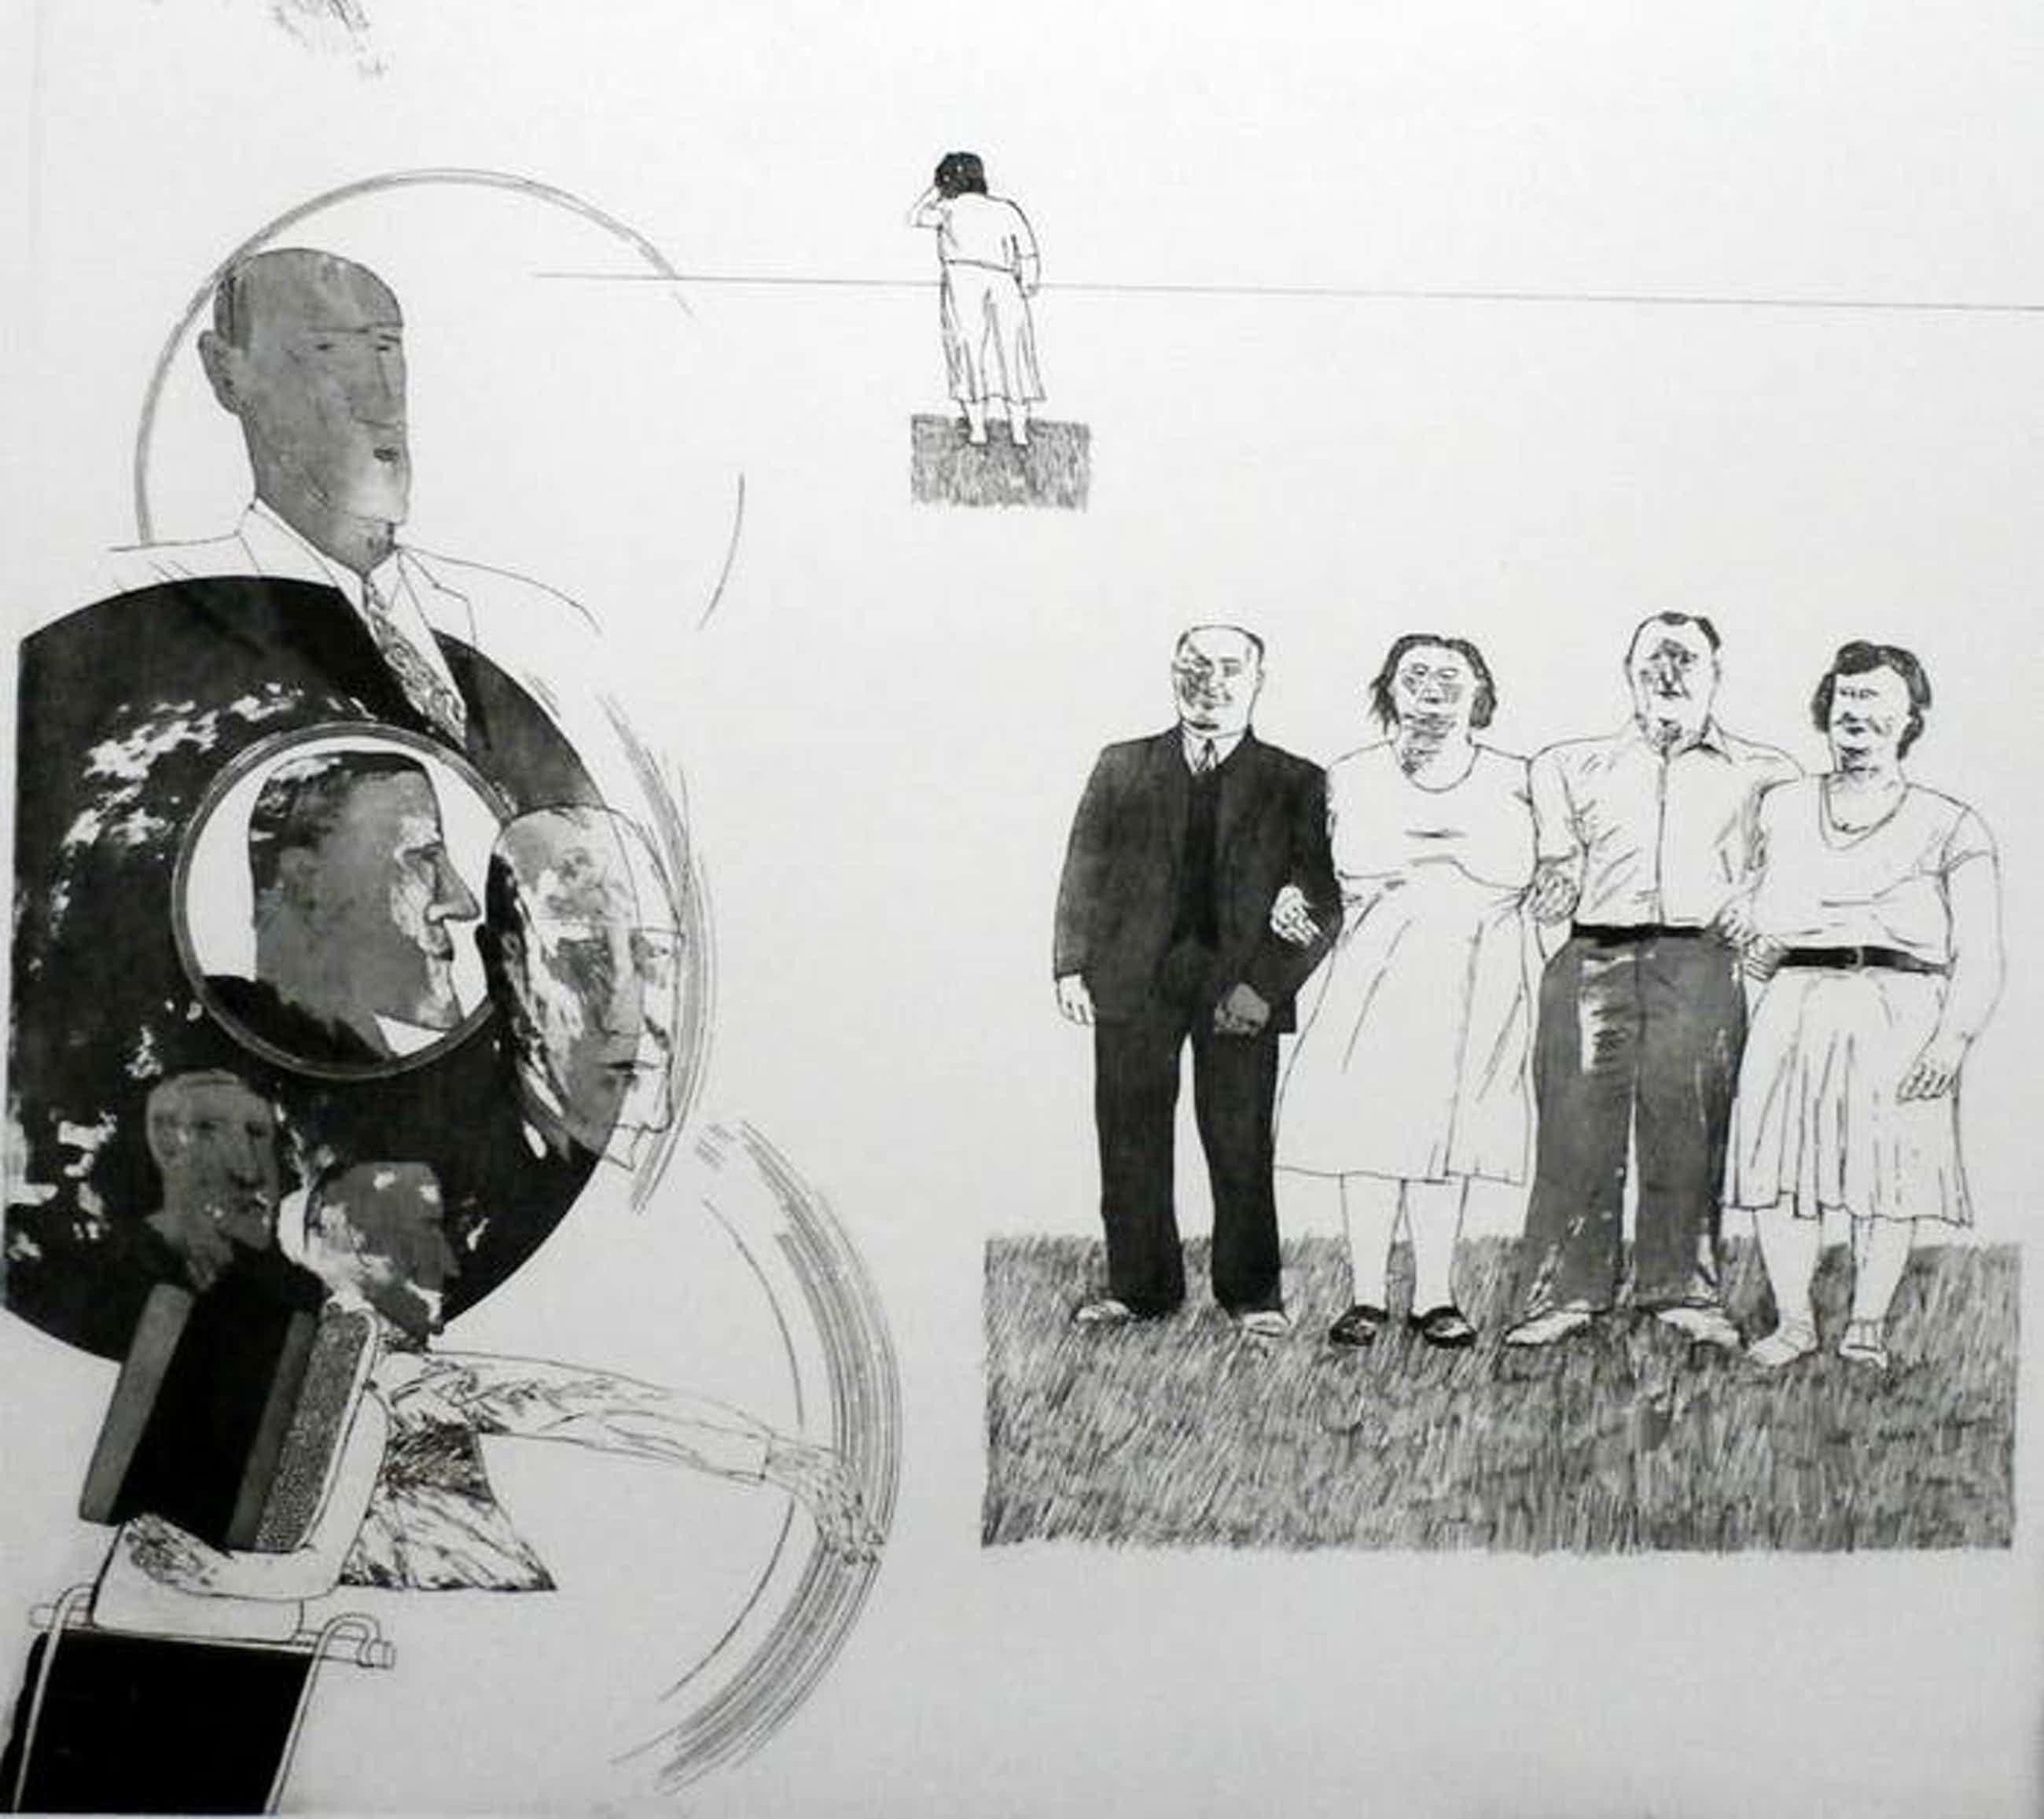 Kees Spermon - Ets/aquatint: Family scene I - 1970 kopen? Bied vanaf 50!